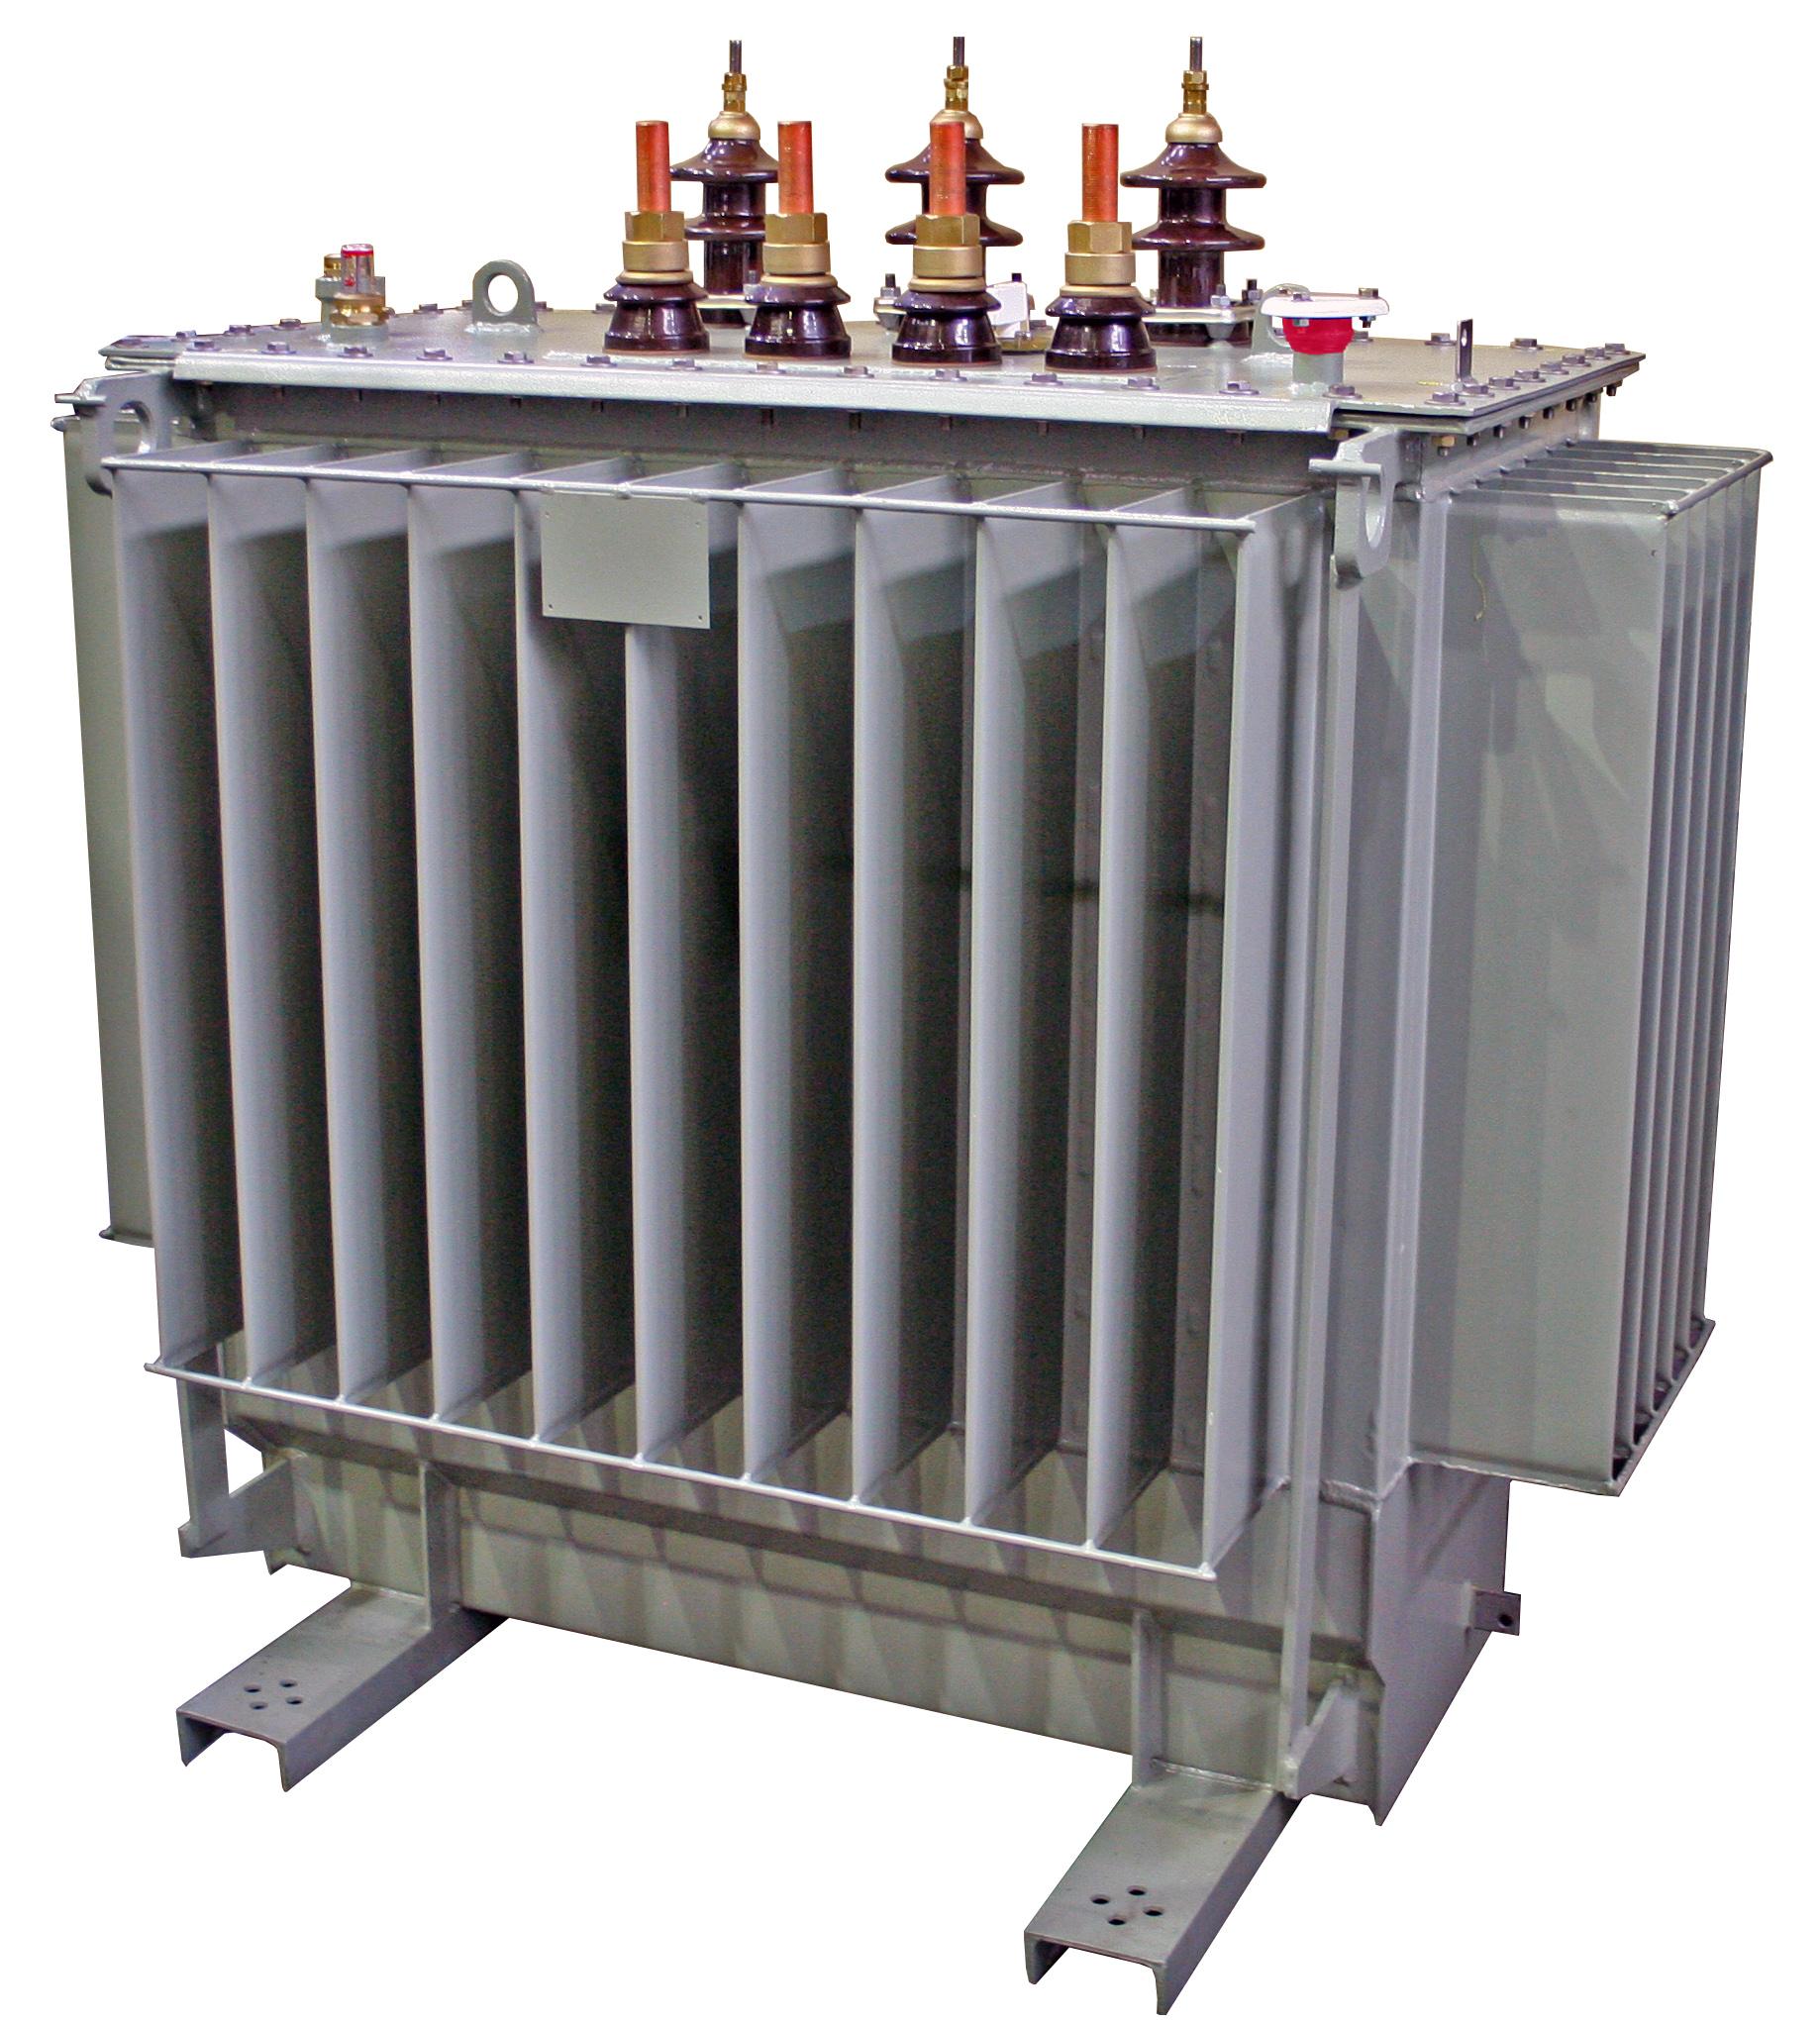 ТМГ32 transformers (energy-saving)